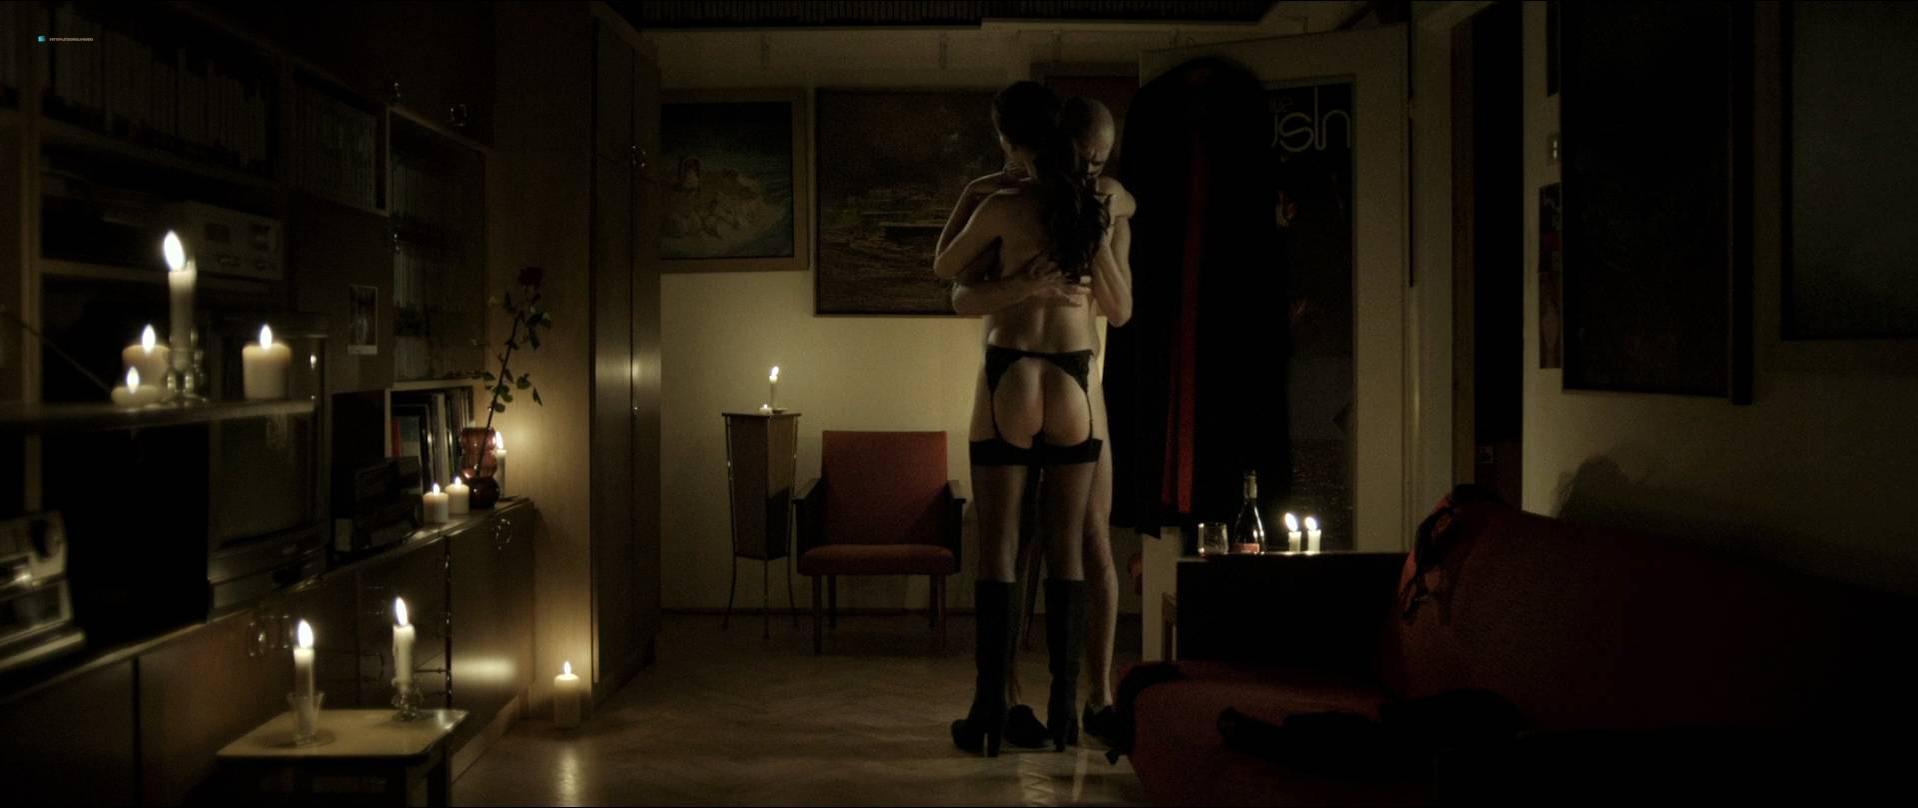 Alicja Karluk nude, Agnieszka Michalska nude - Ostatnia rodzina (2016)